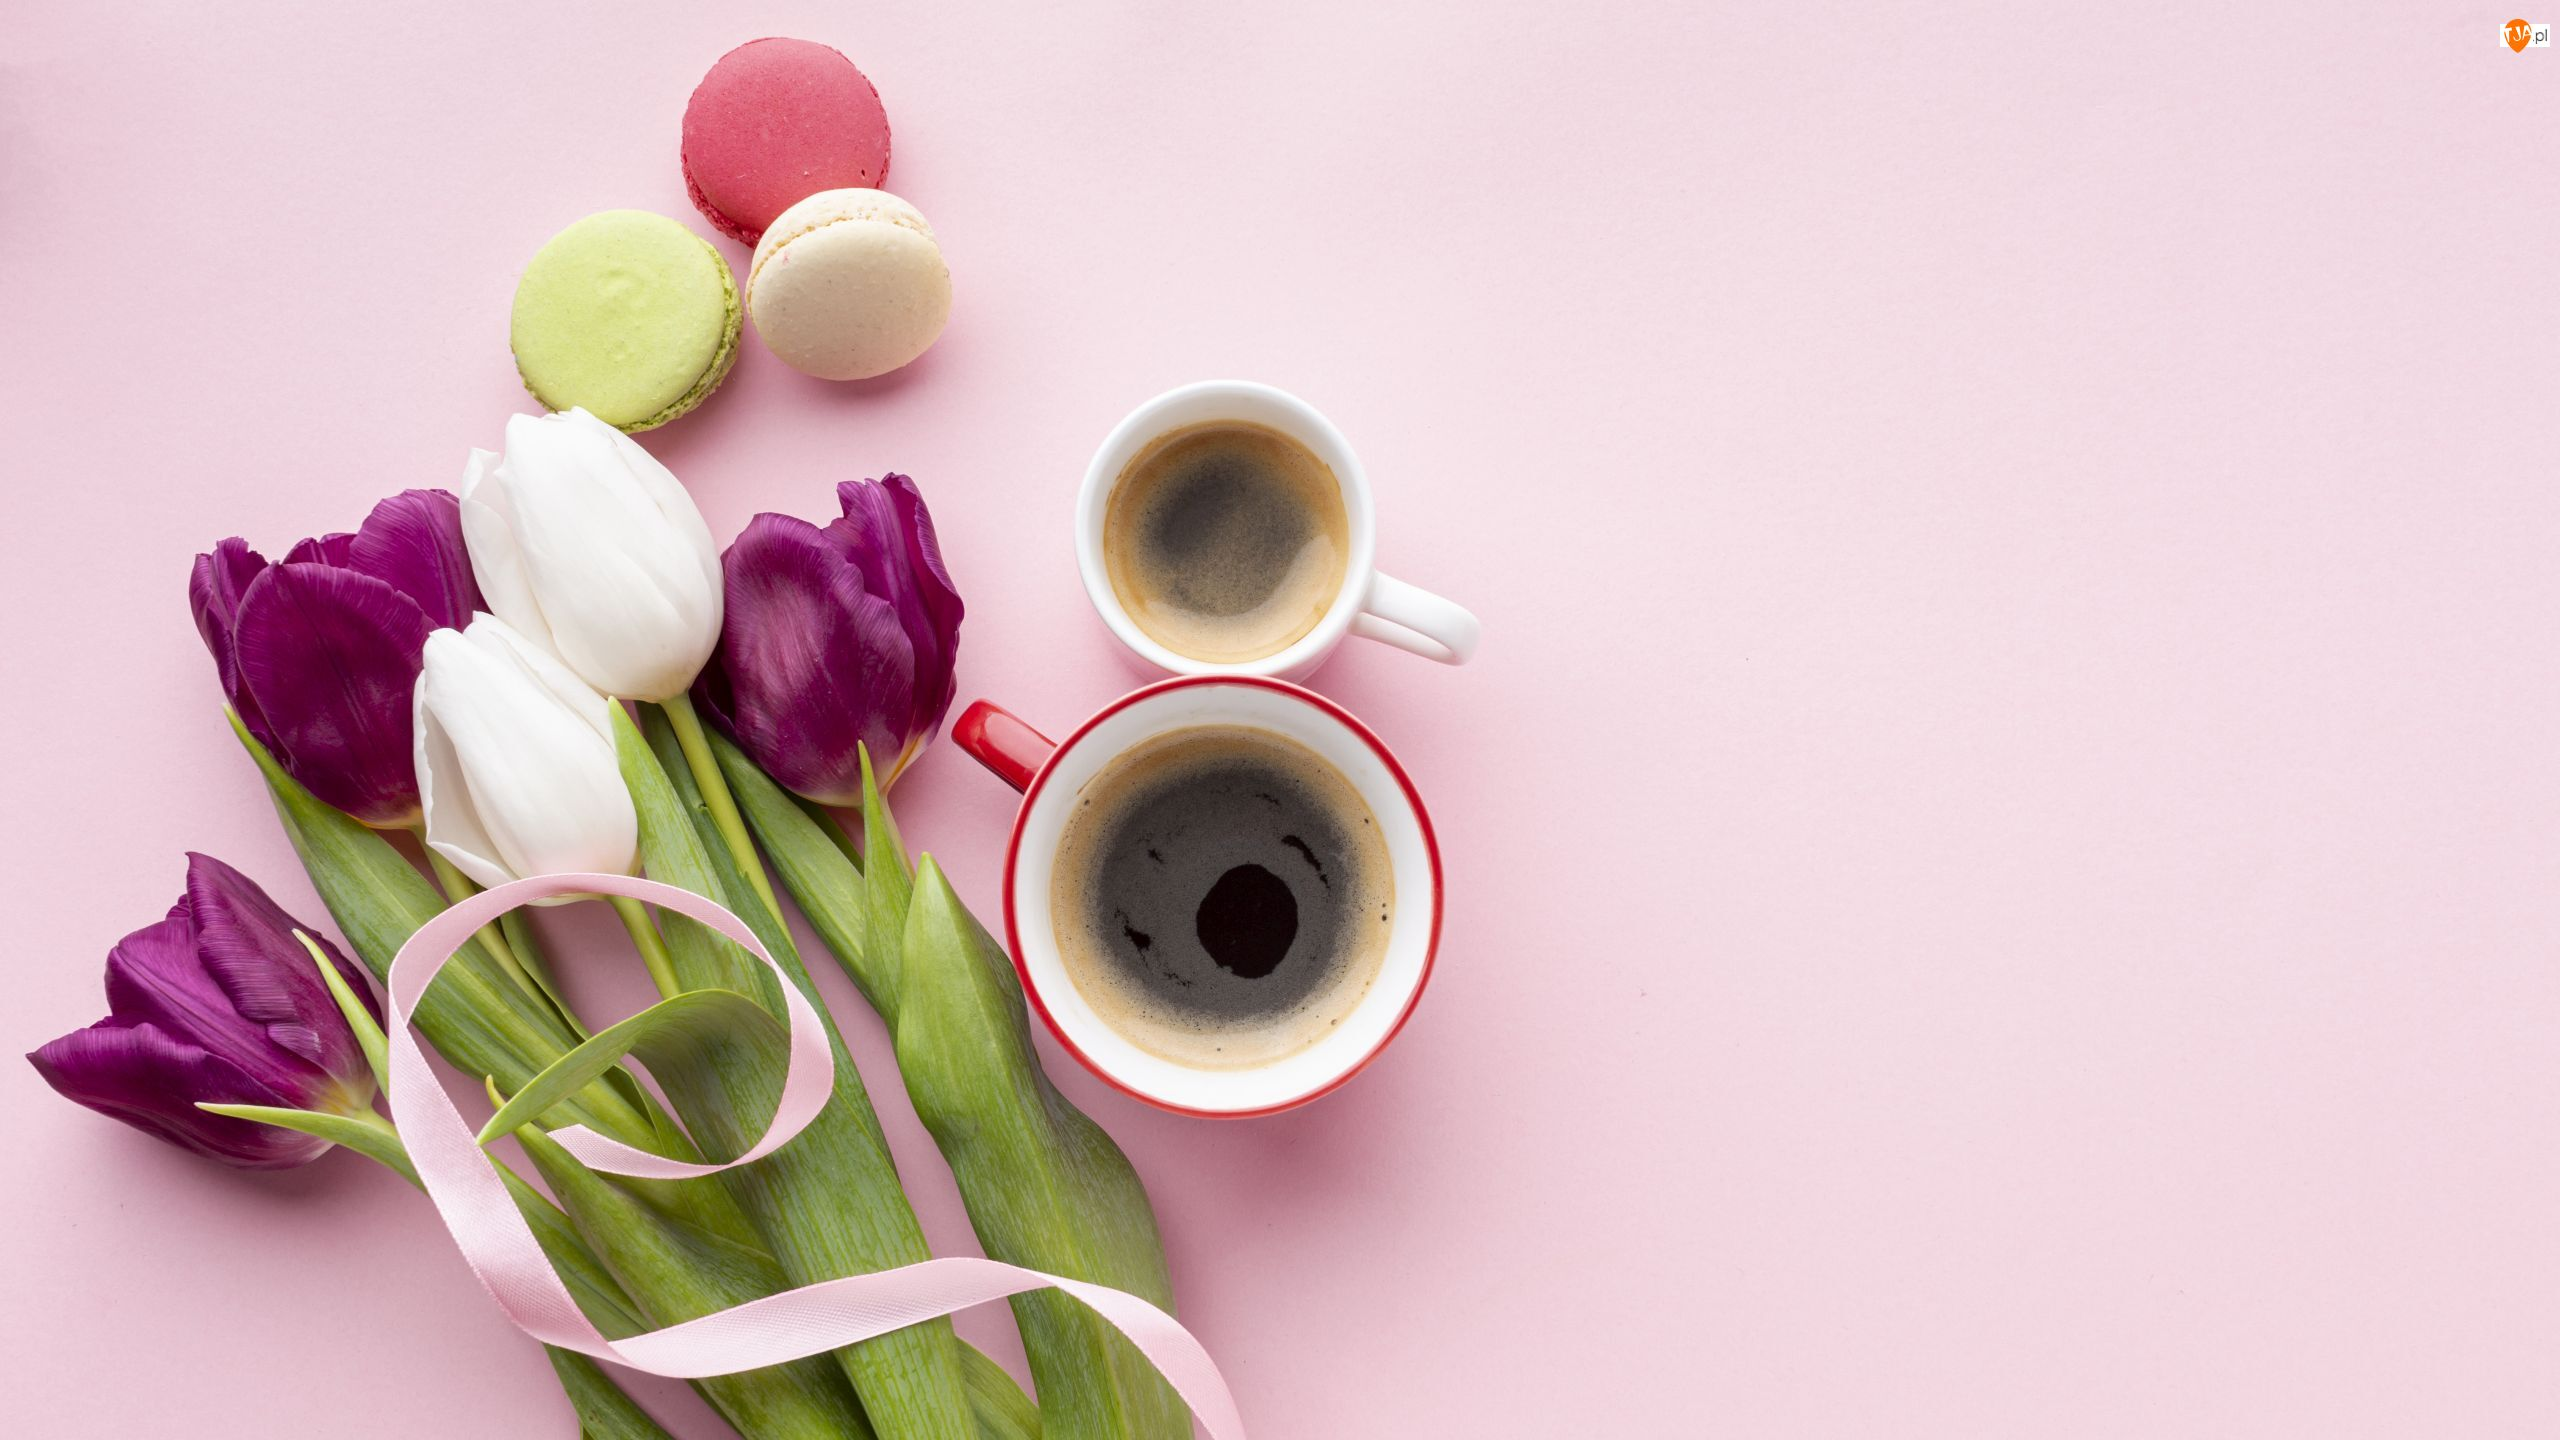 Tulipany, Kwiaty, Kawa, Makaroniki, Kubki, Ciasteczka